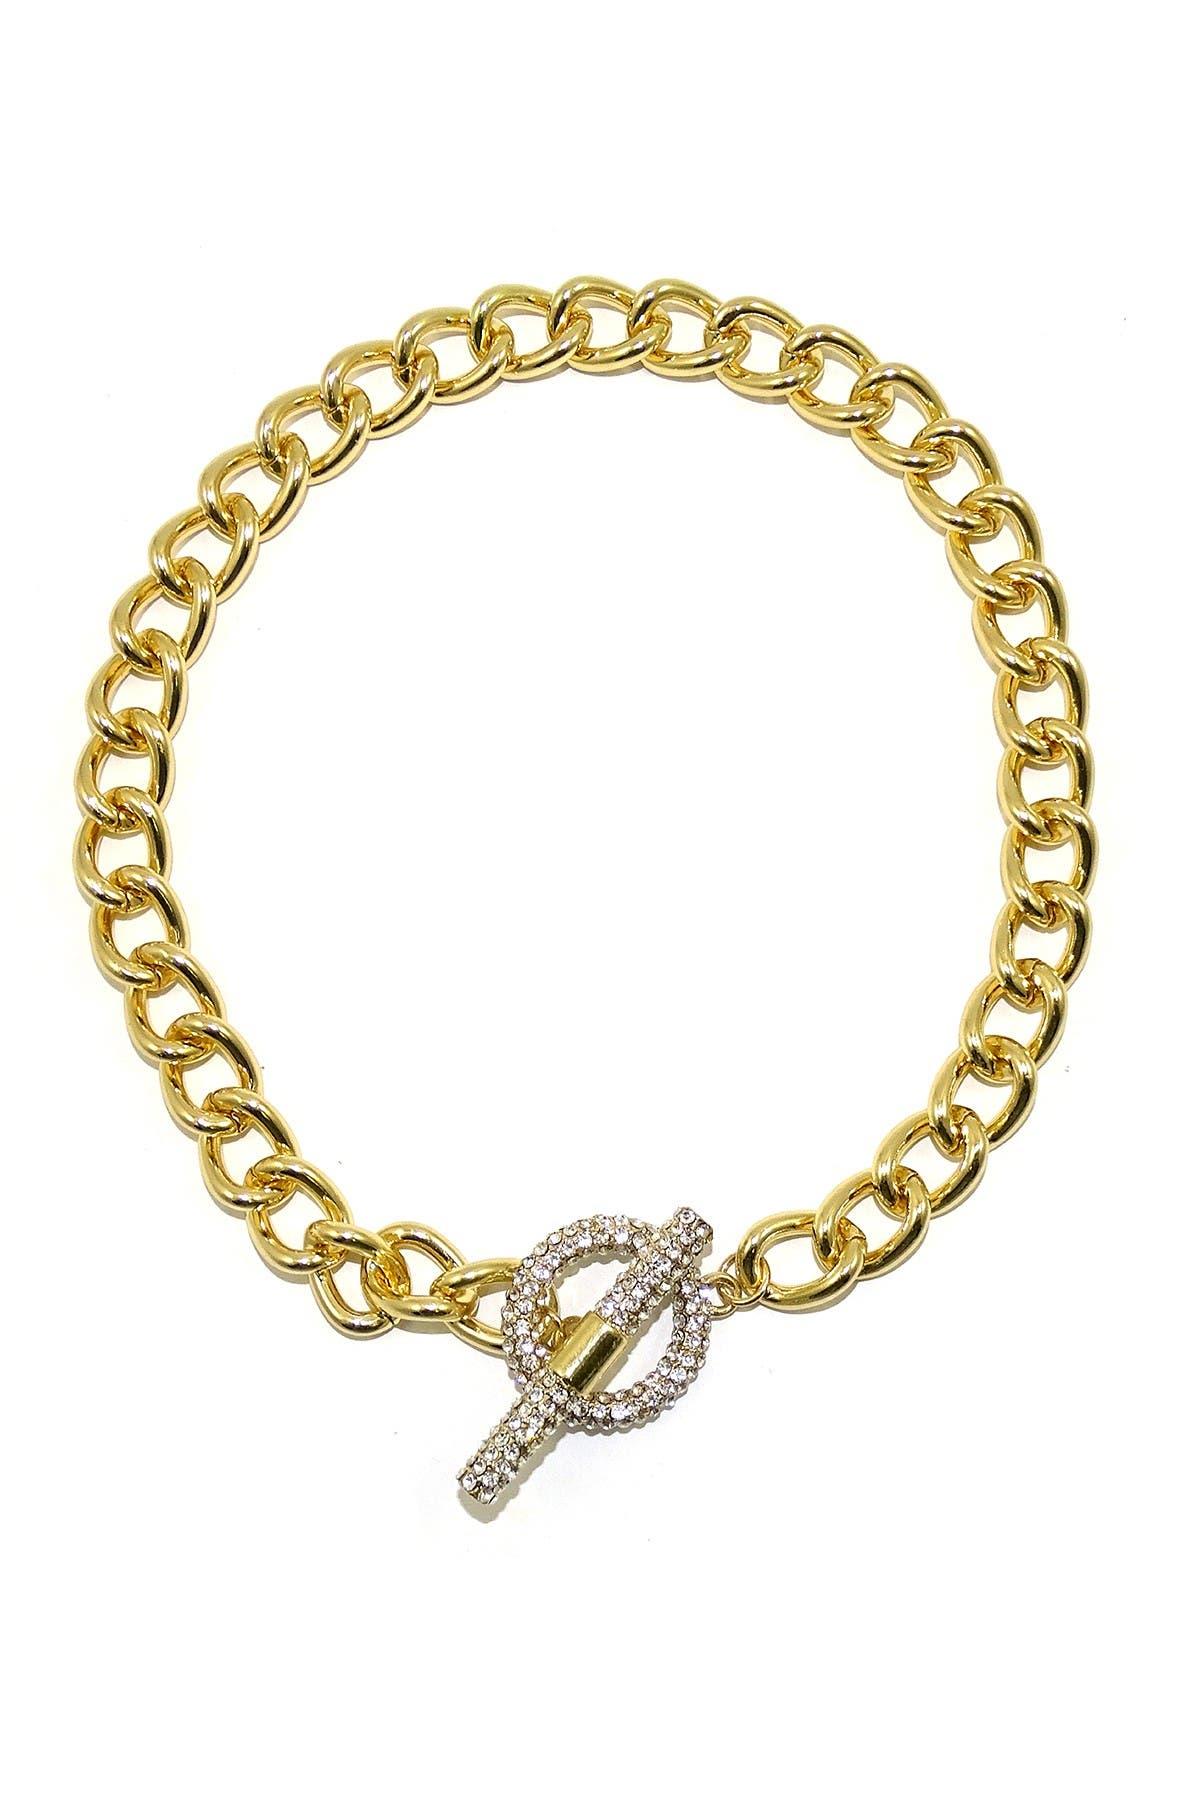 Image of Savvy Cie CZ Cuban Link Necklace